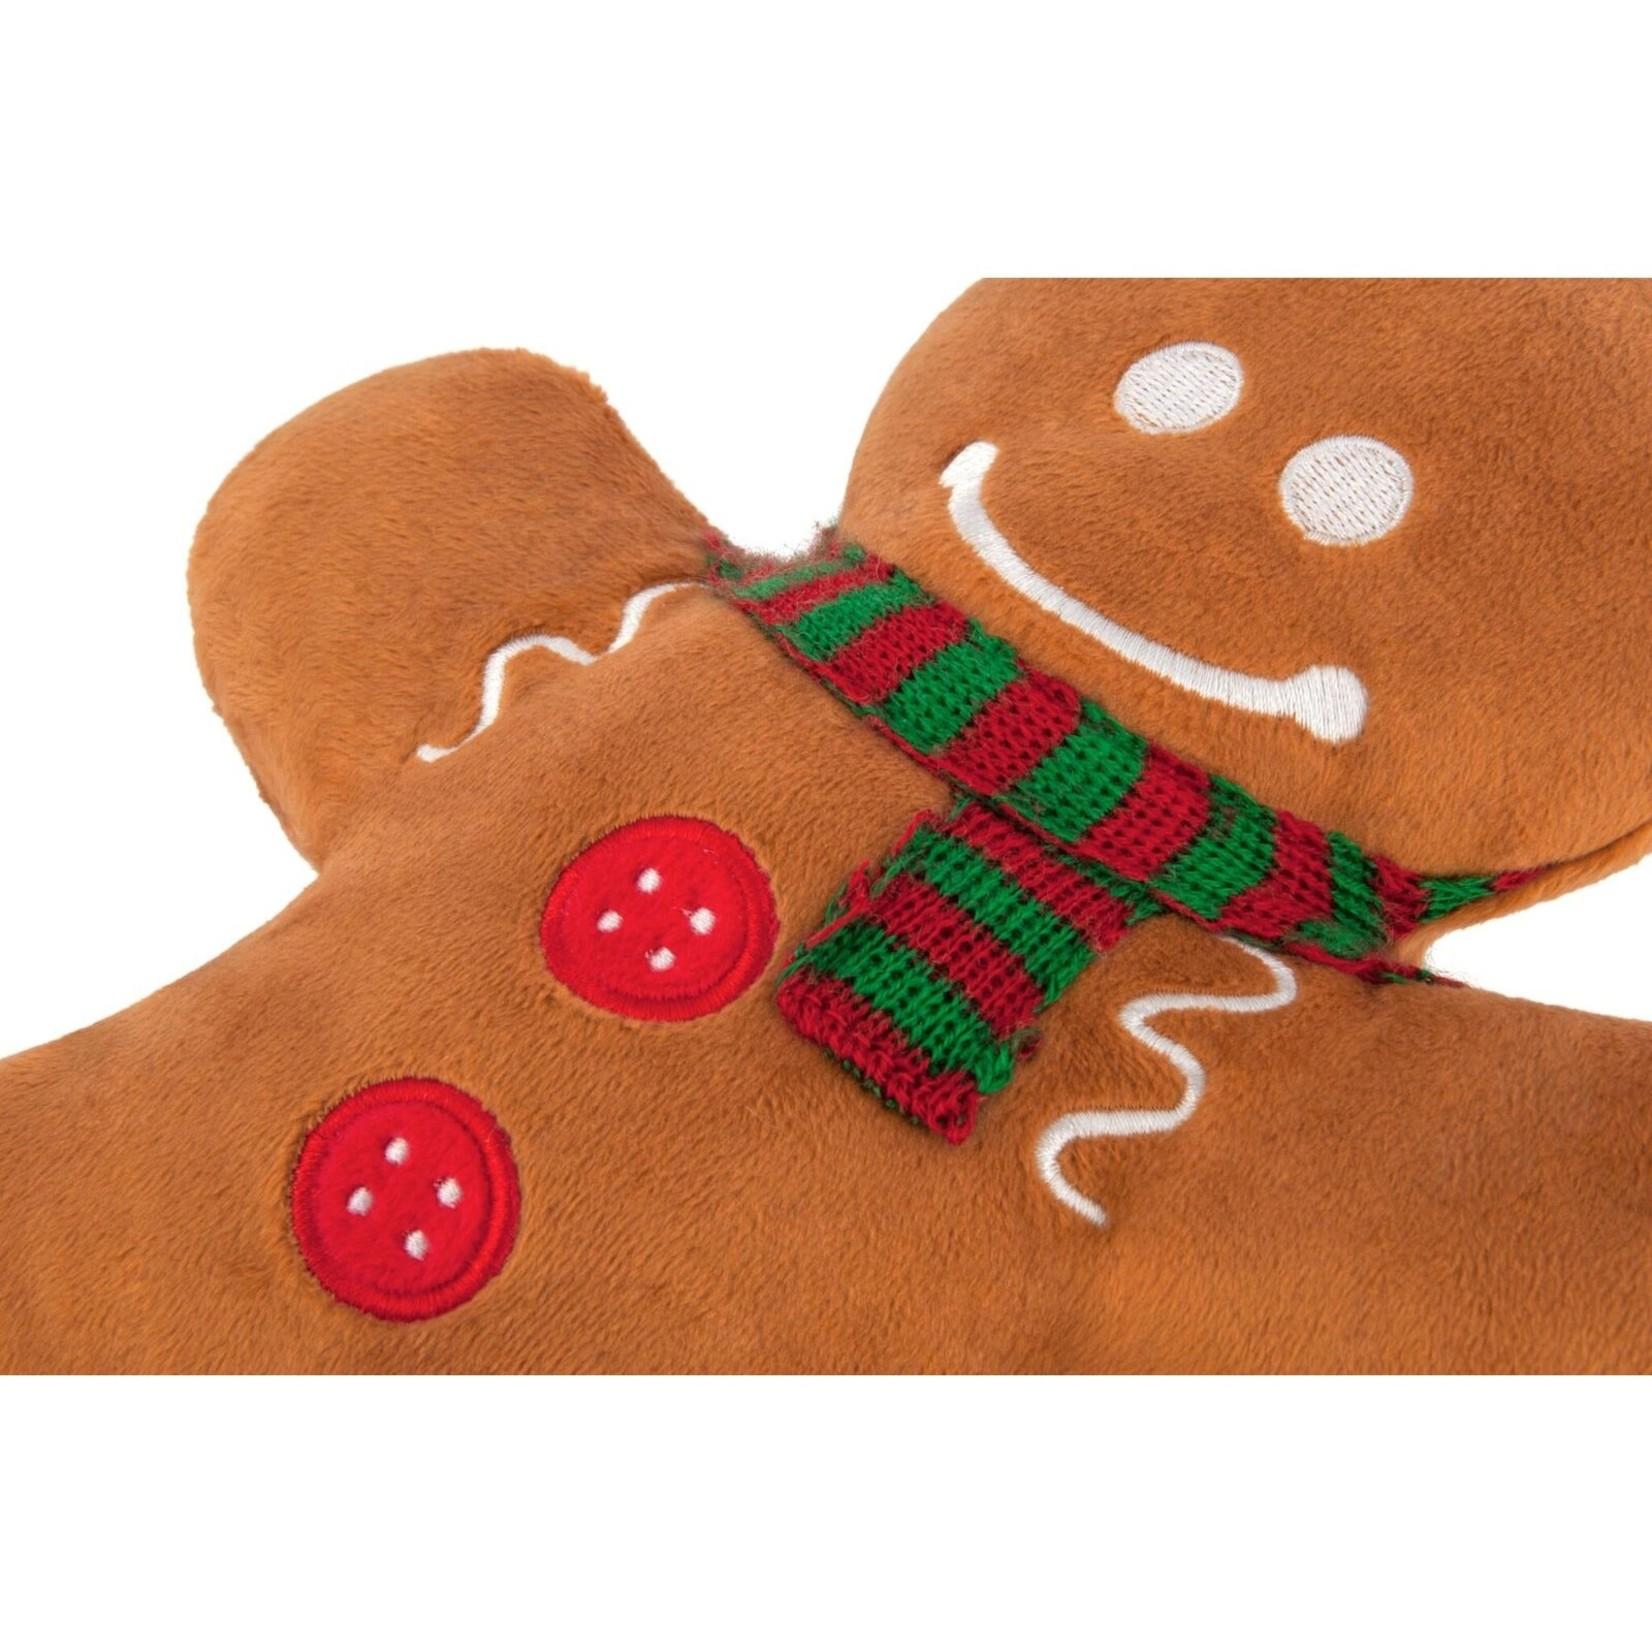 PLAY PLAY Gingerbread Man